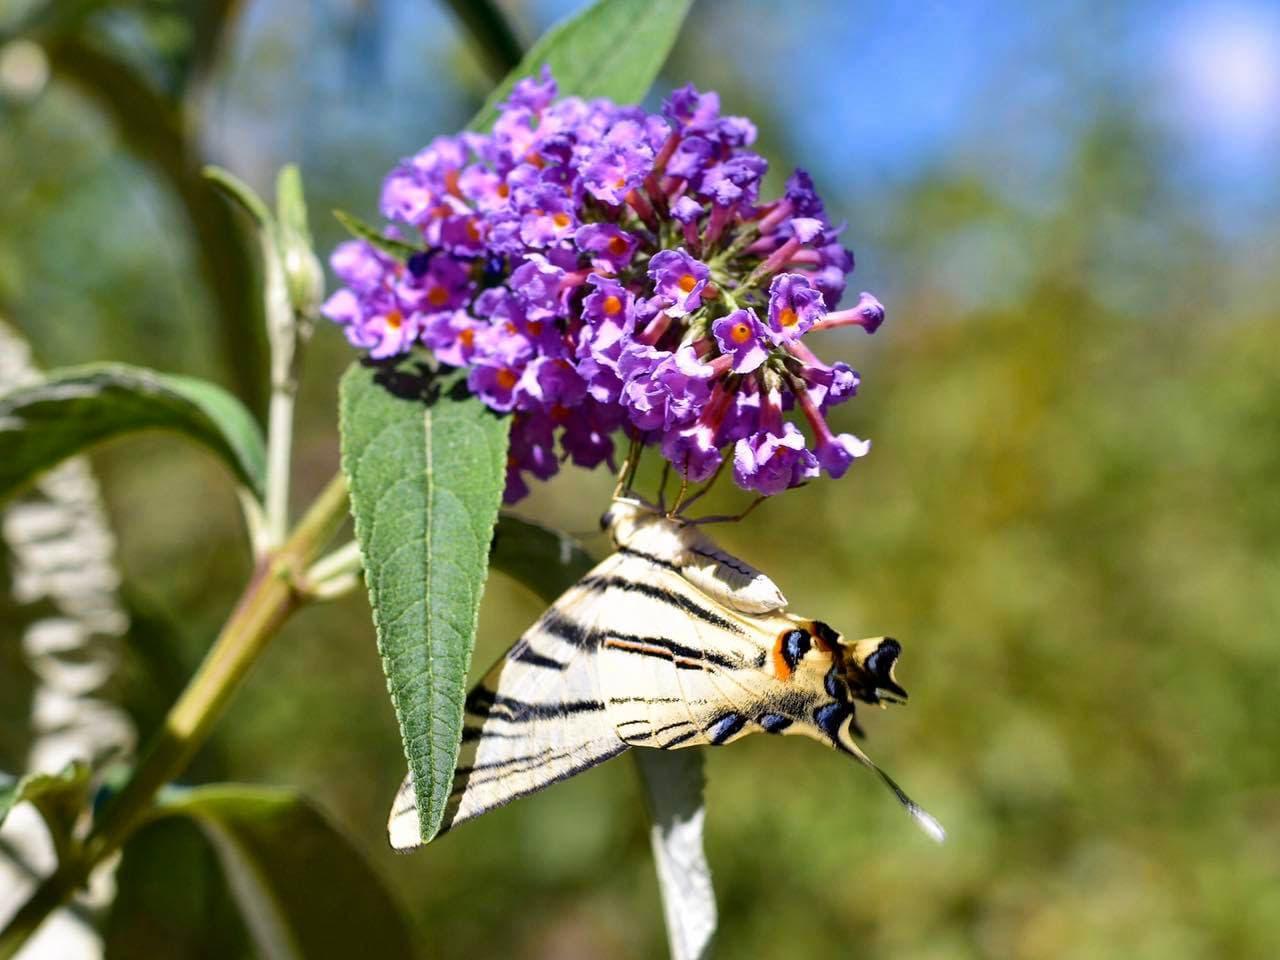 botanical park chania crete, farm animals, endemic herbs, cretan flowers, wild birds, cretan fauna flora, cretan nature